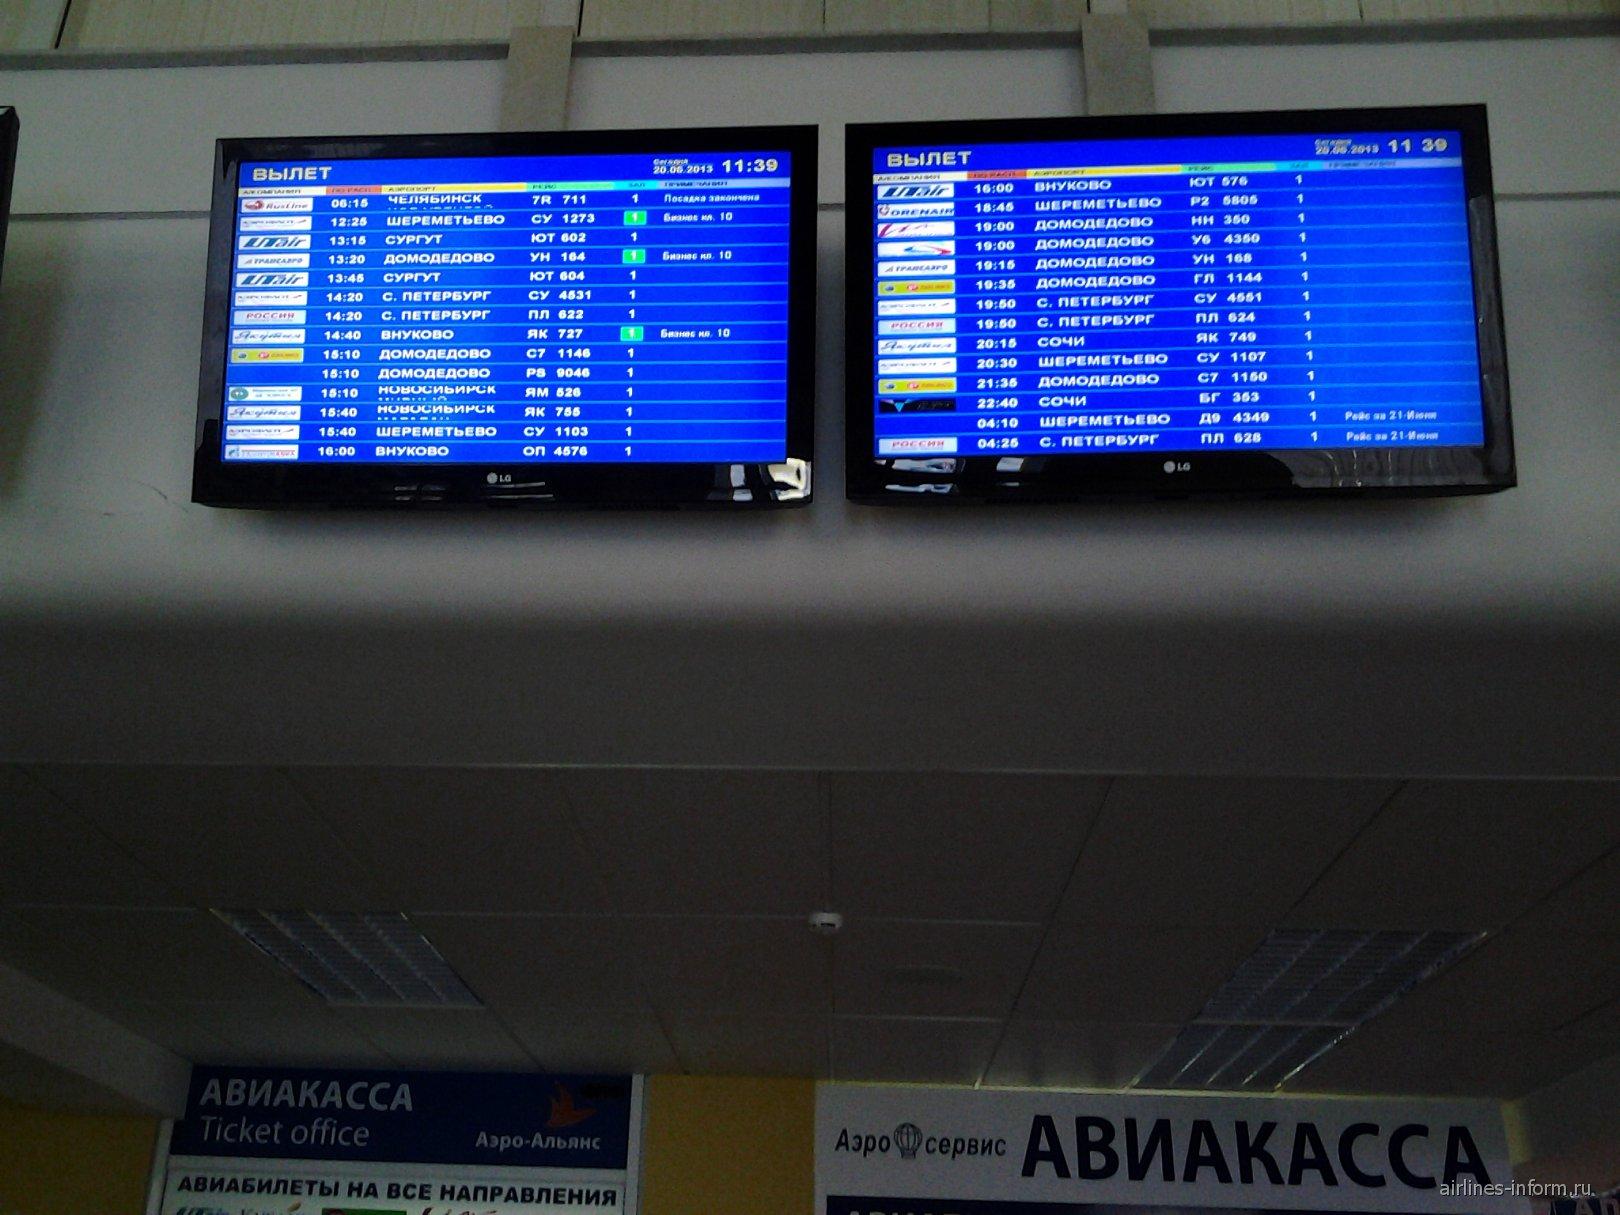 Табло вылетов в аэропорту Краснодар Пашковская